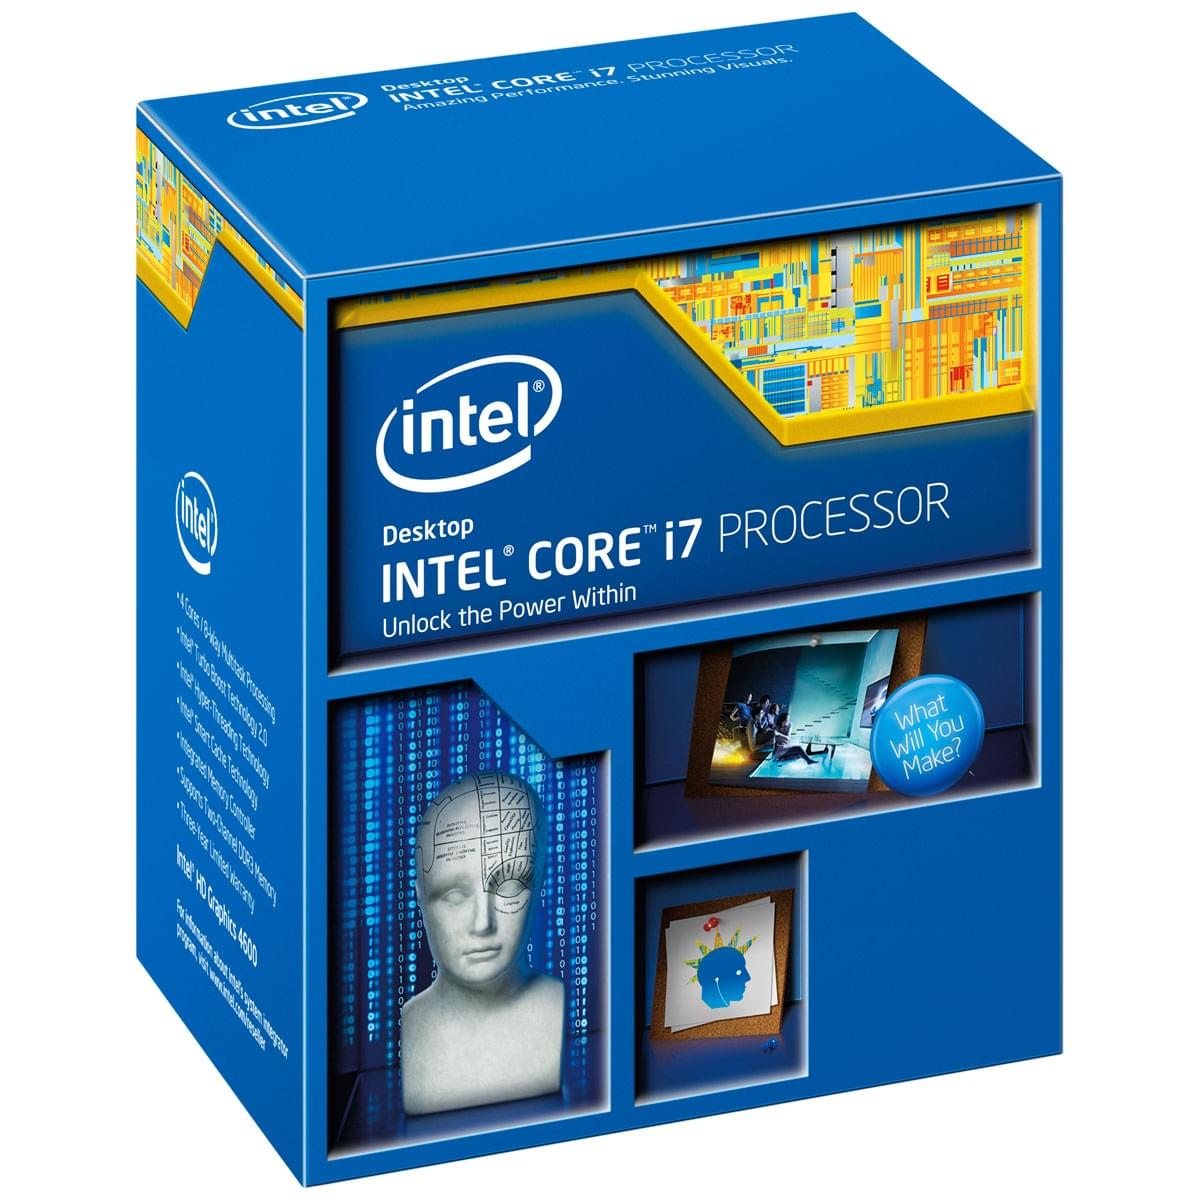 Processeur Intel Core i7 4790K - 4GHz - Gamer -  - 0